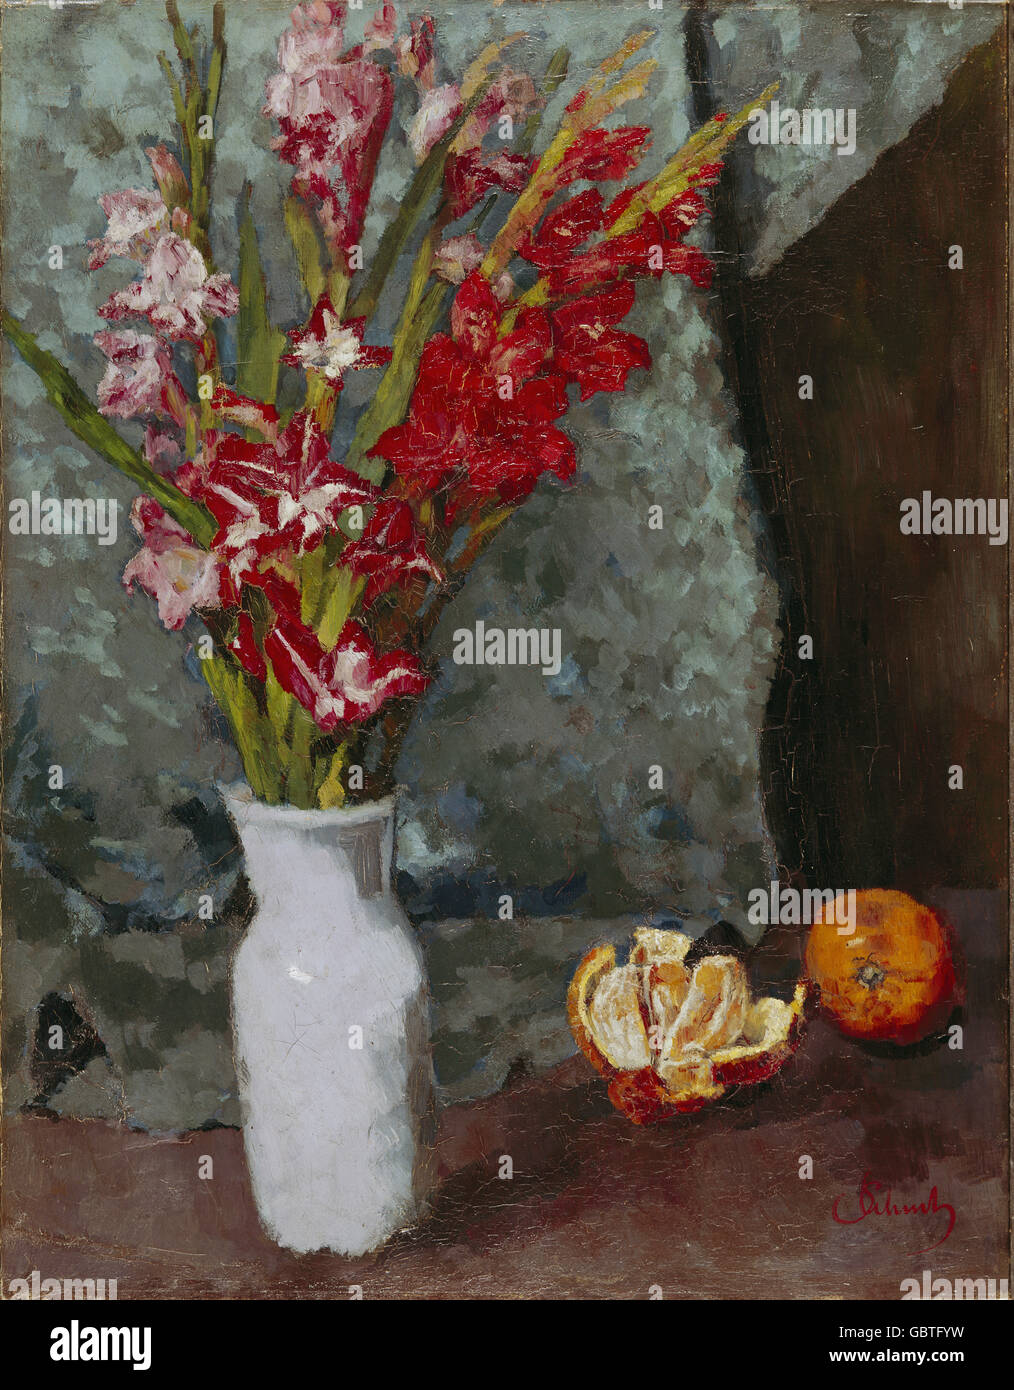 Belle arti, Schuch, Karl (1846 - 1903), pittura, 'Gladioli e arance' ('Gladiolen und Apfelsinen'), Immagini Stock